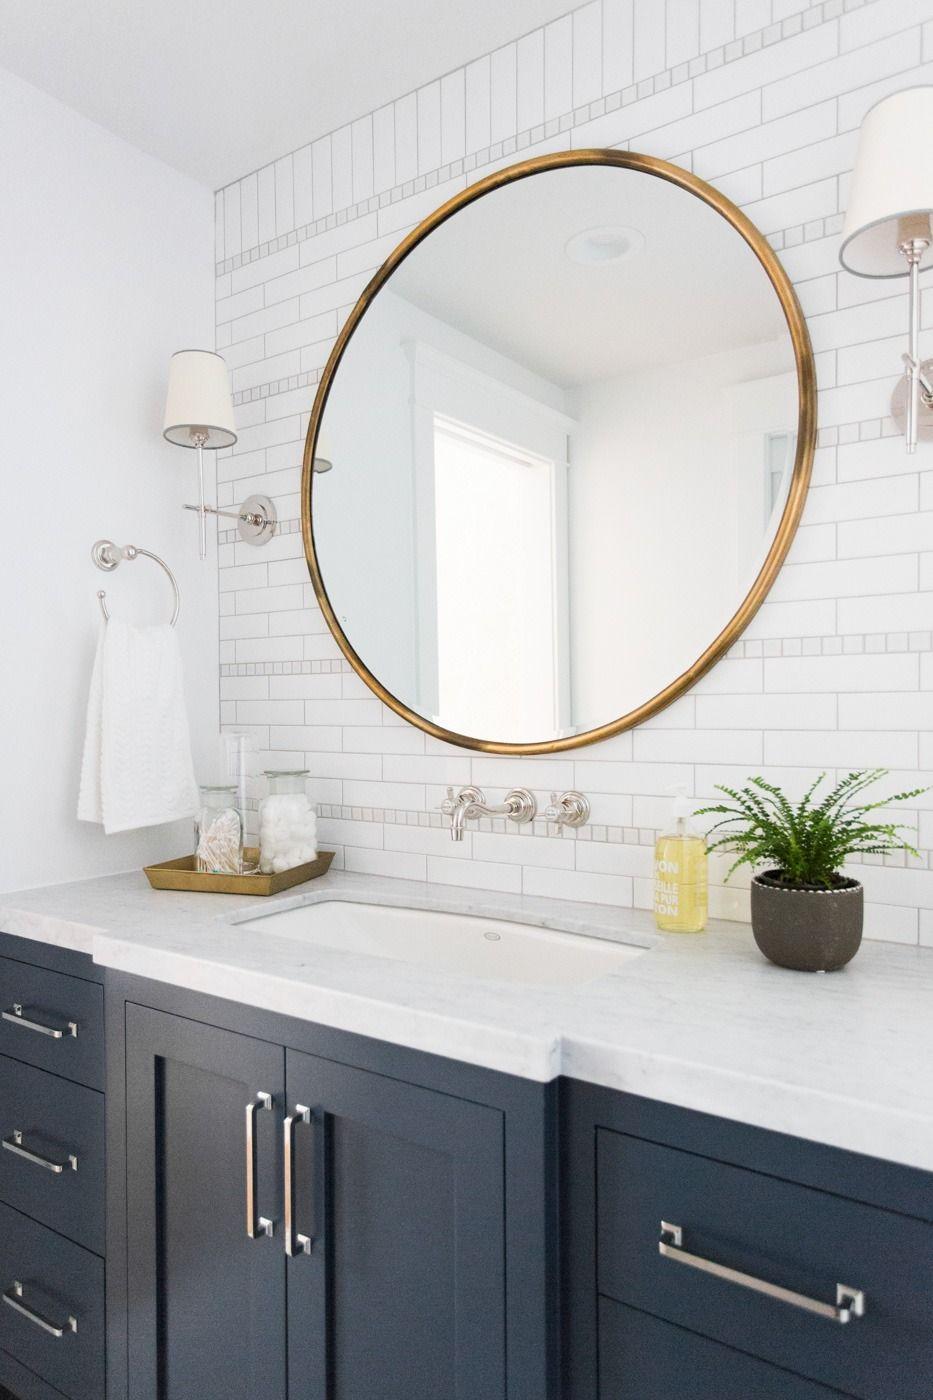 Windsong tour basement pt minimalist mirrors wall mount